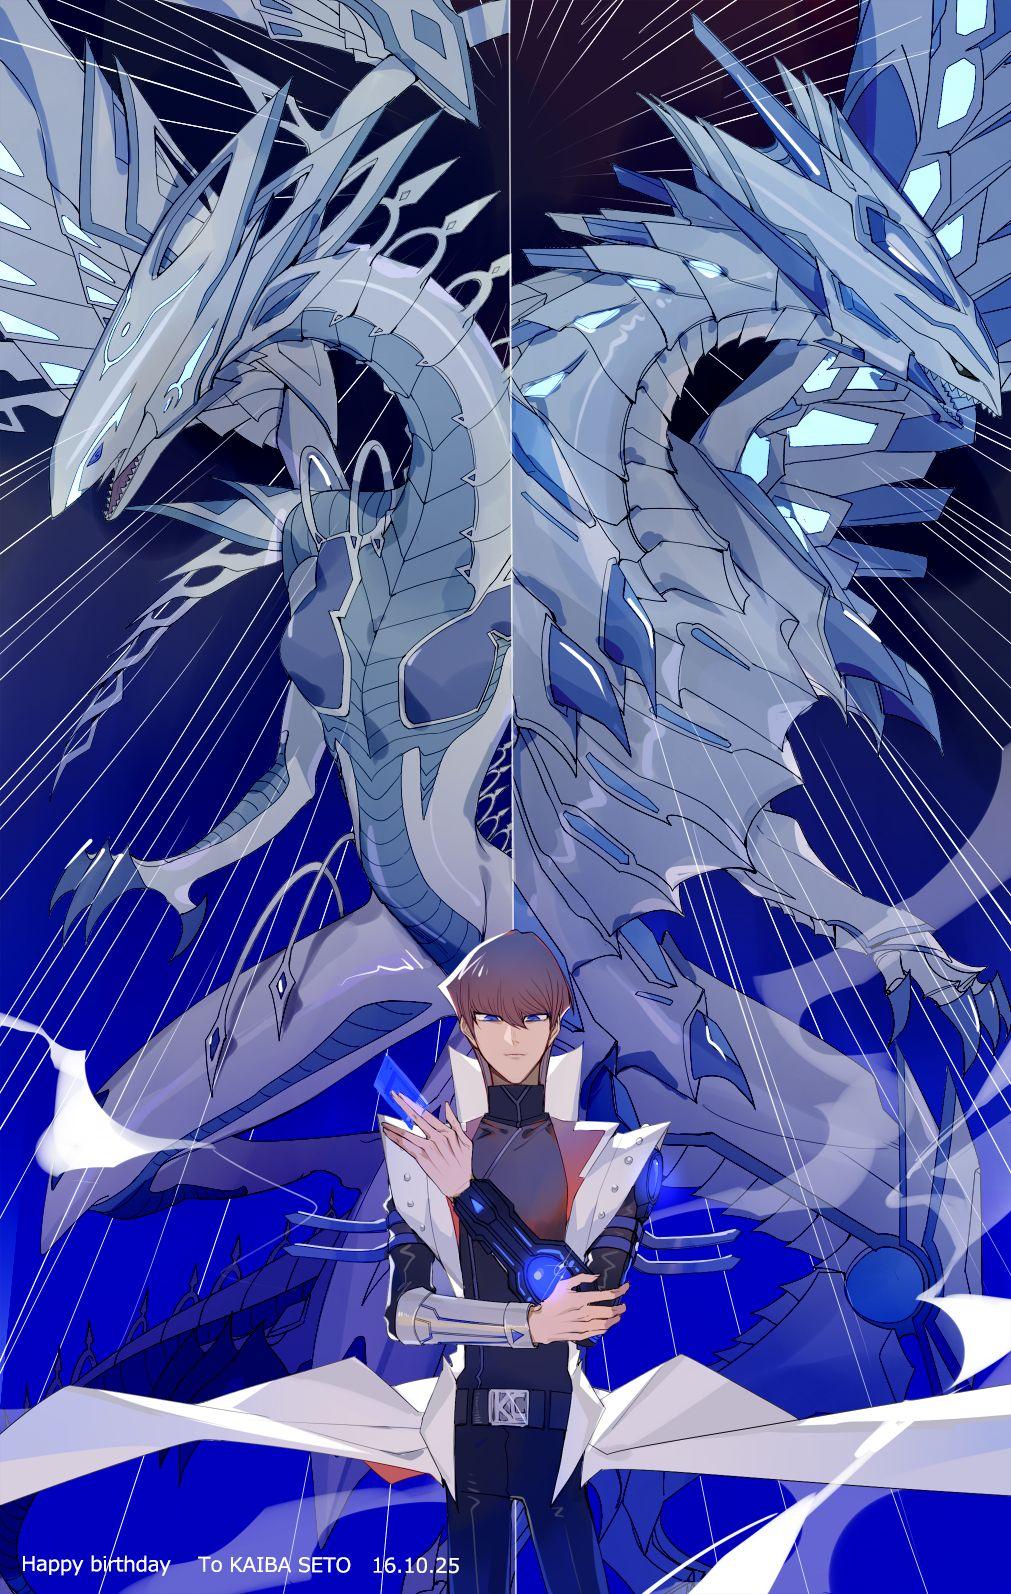 2048186 Jpg 1011 1594 Anime Anime Images